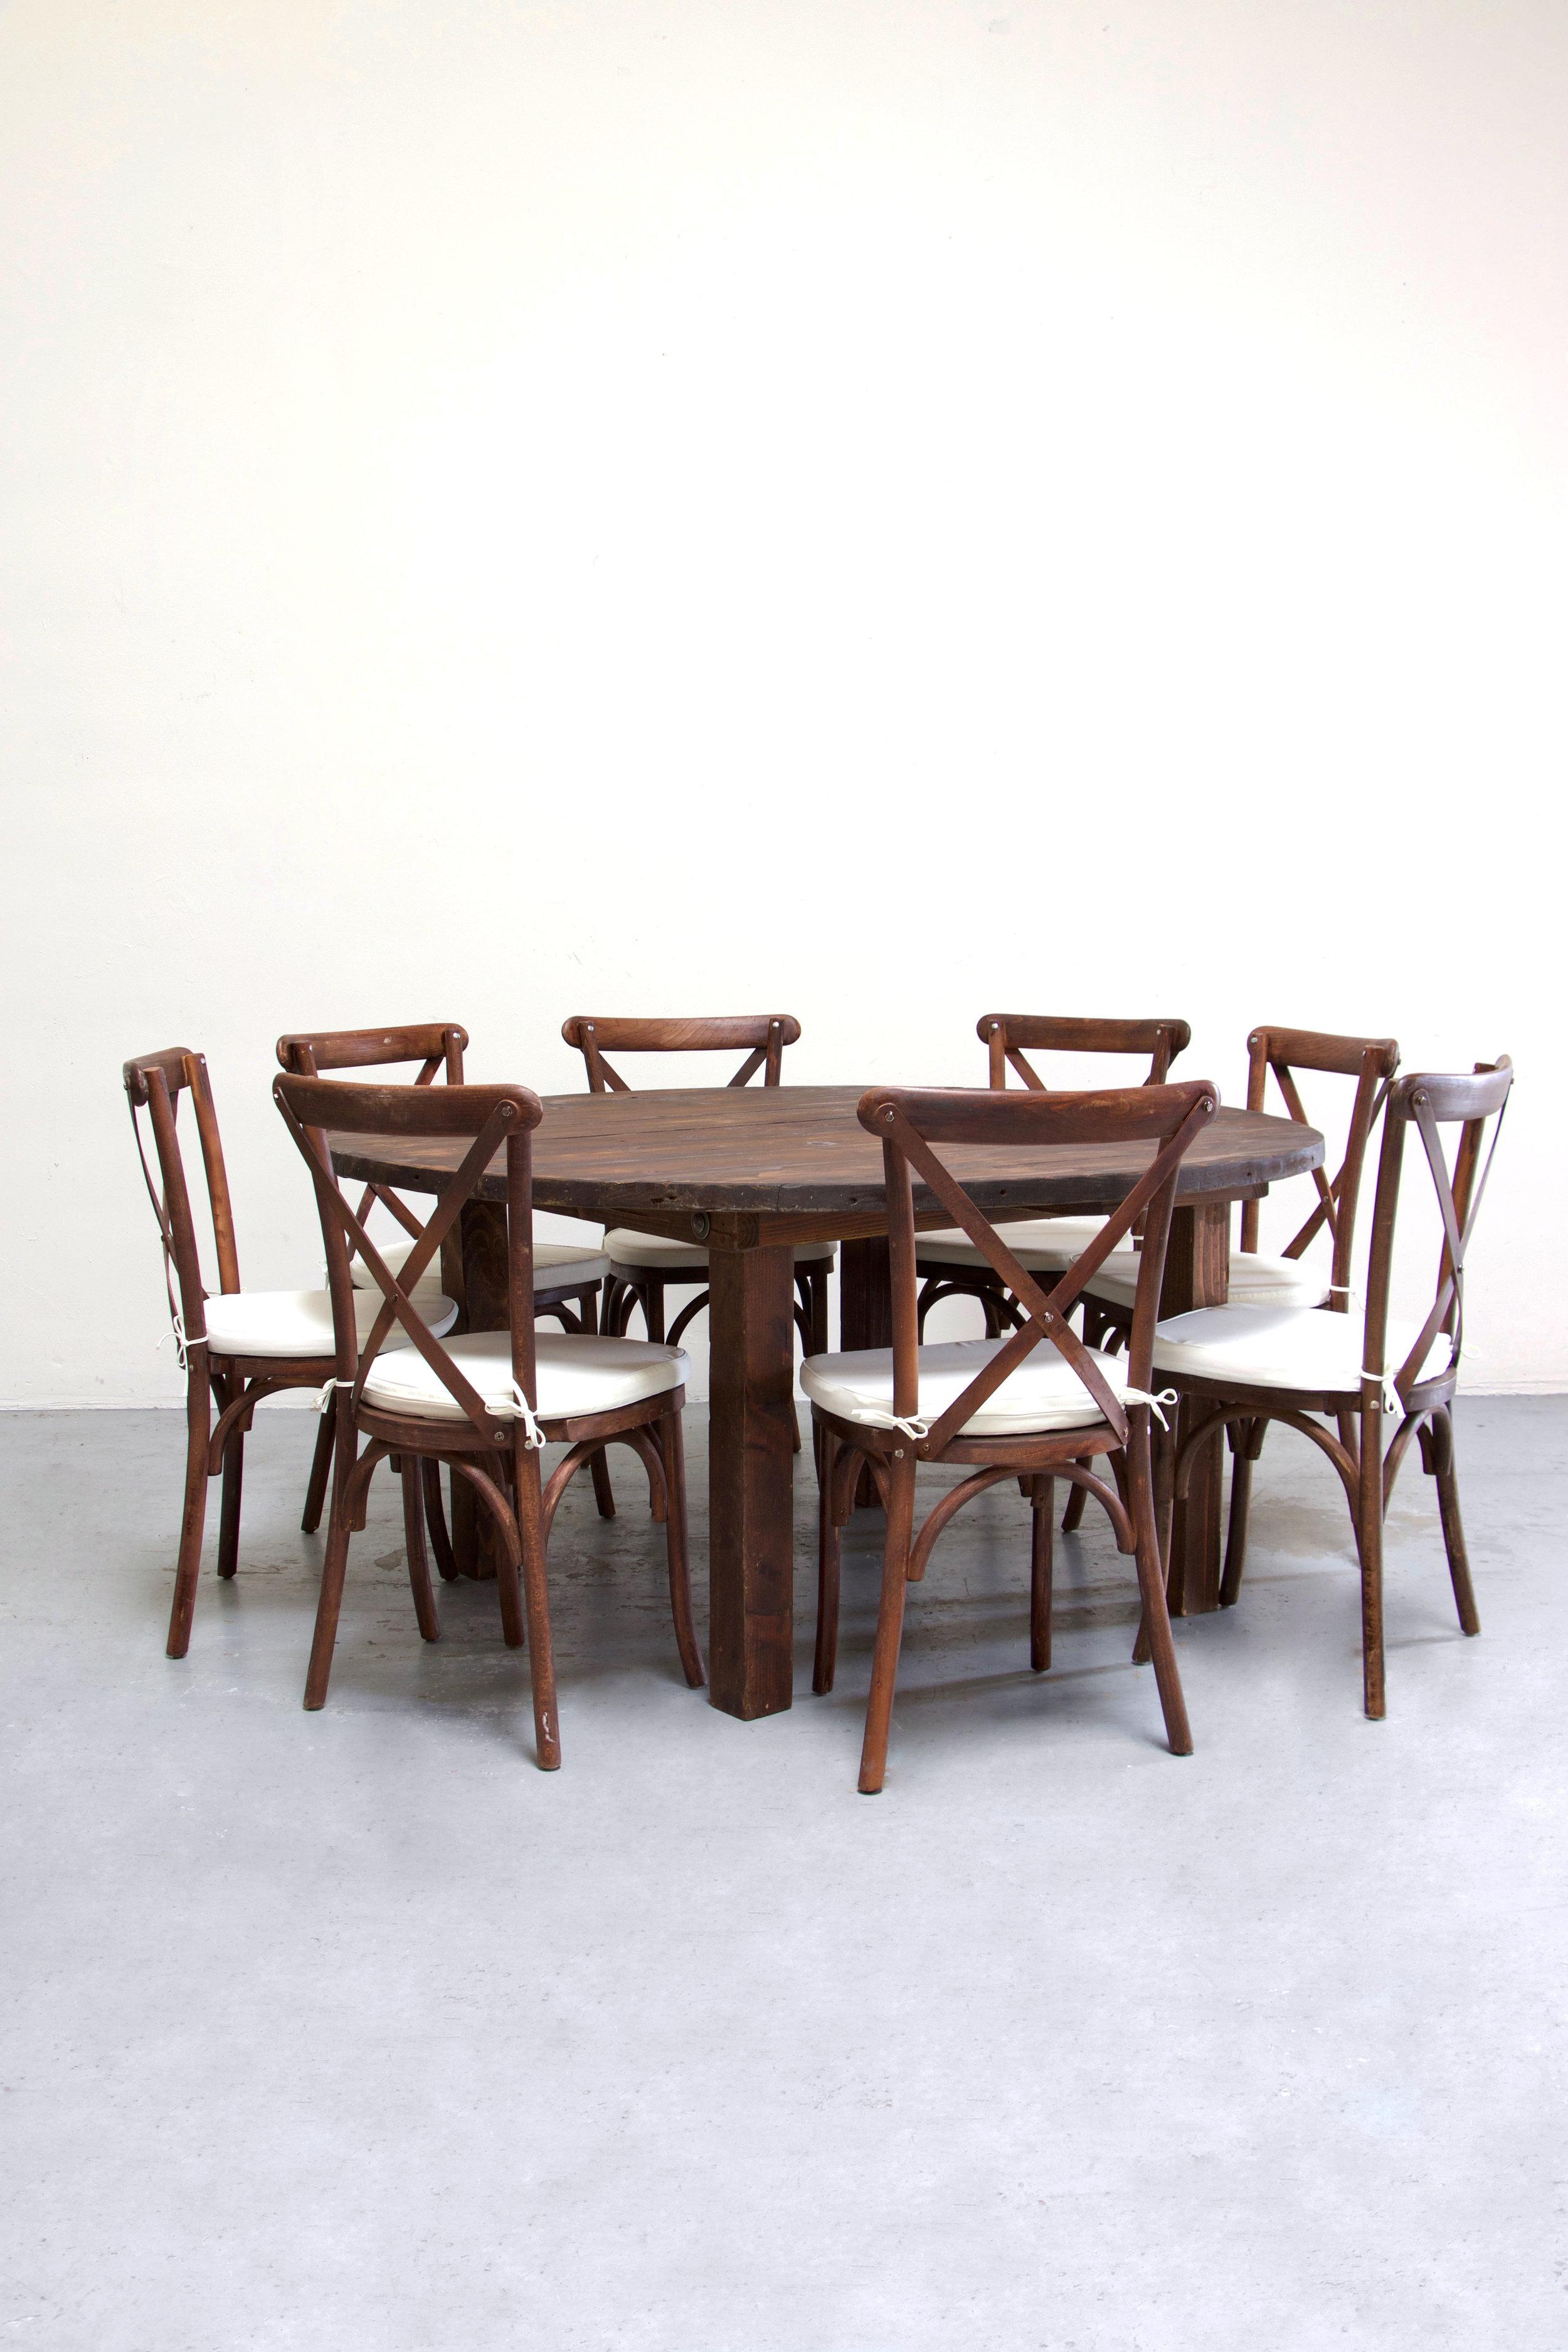 $145 1 Round Mahogany Farm Table w/ 8 Cross-Back Chairs